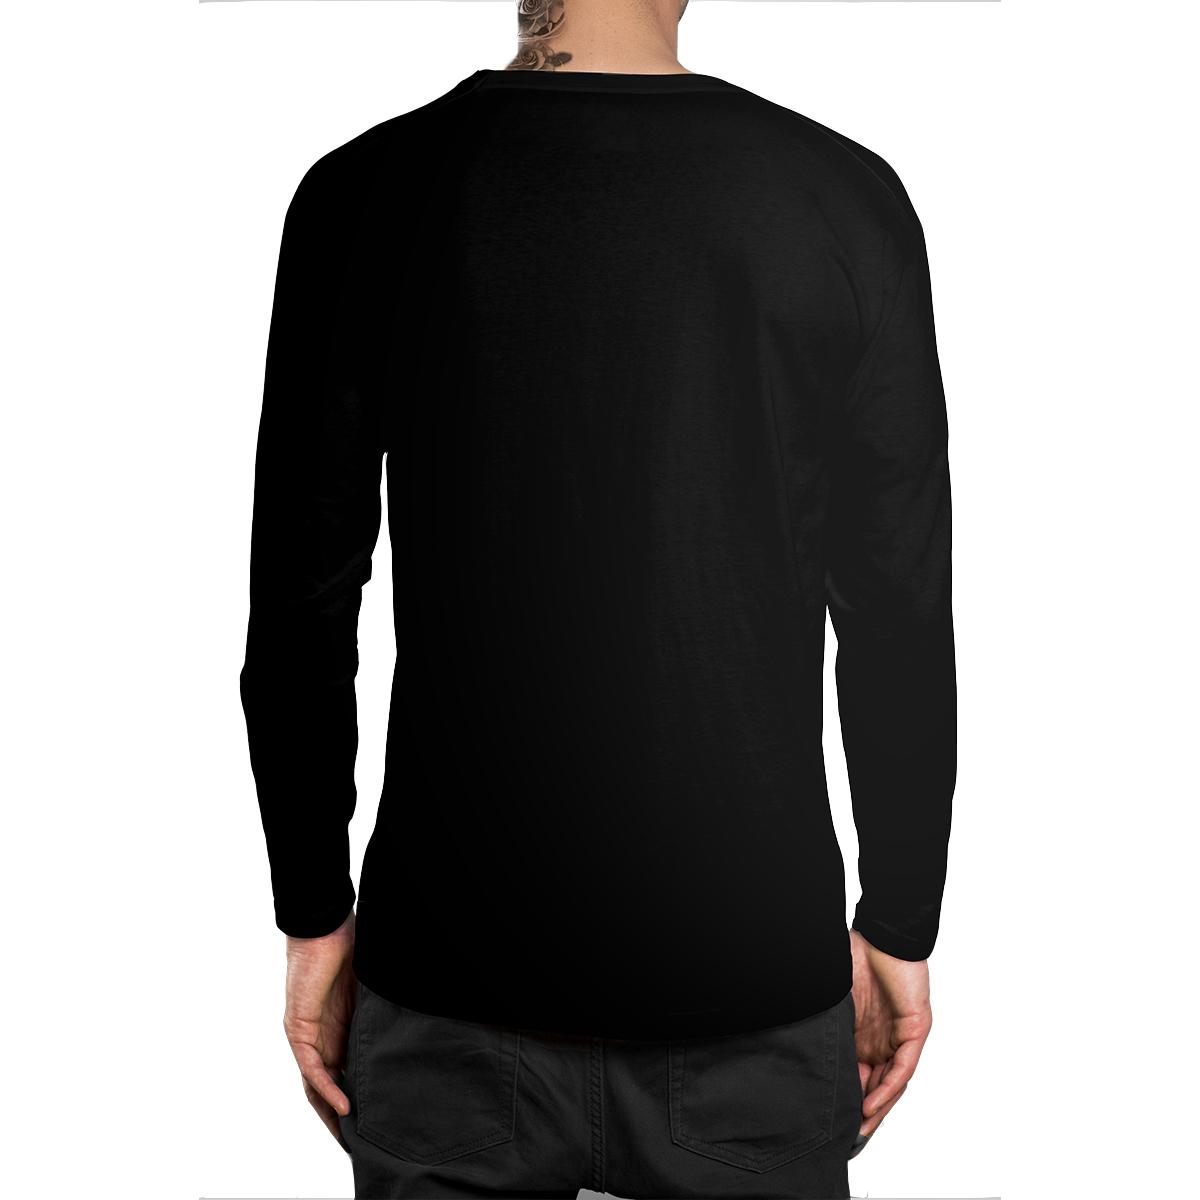 Stompy Camiseta Manga Longa Modelo 39